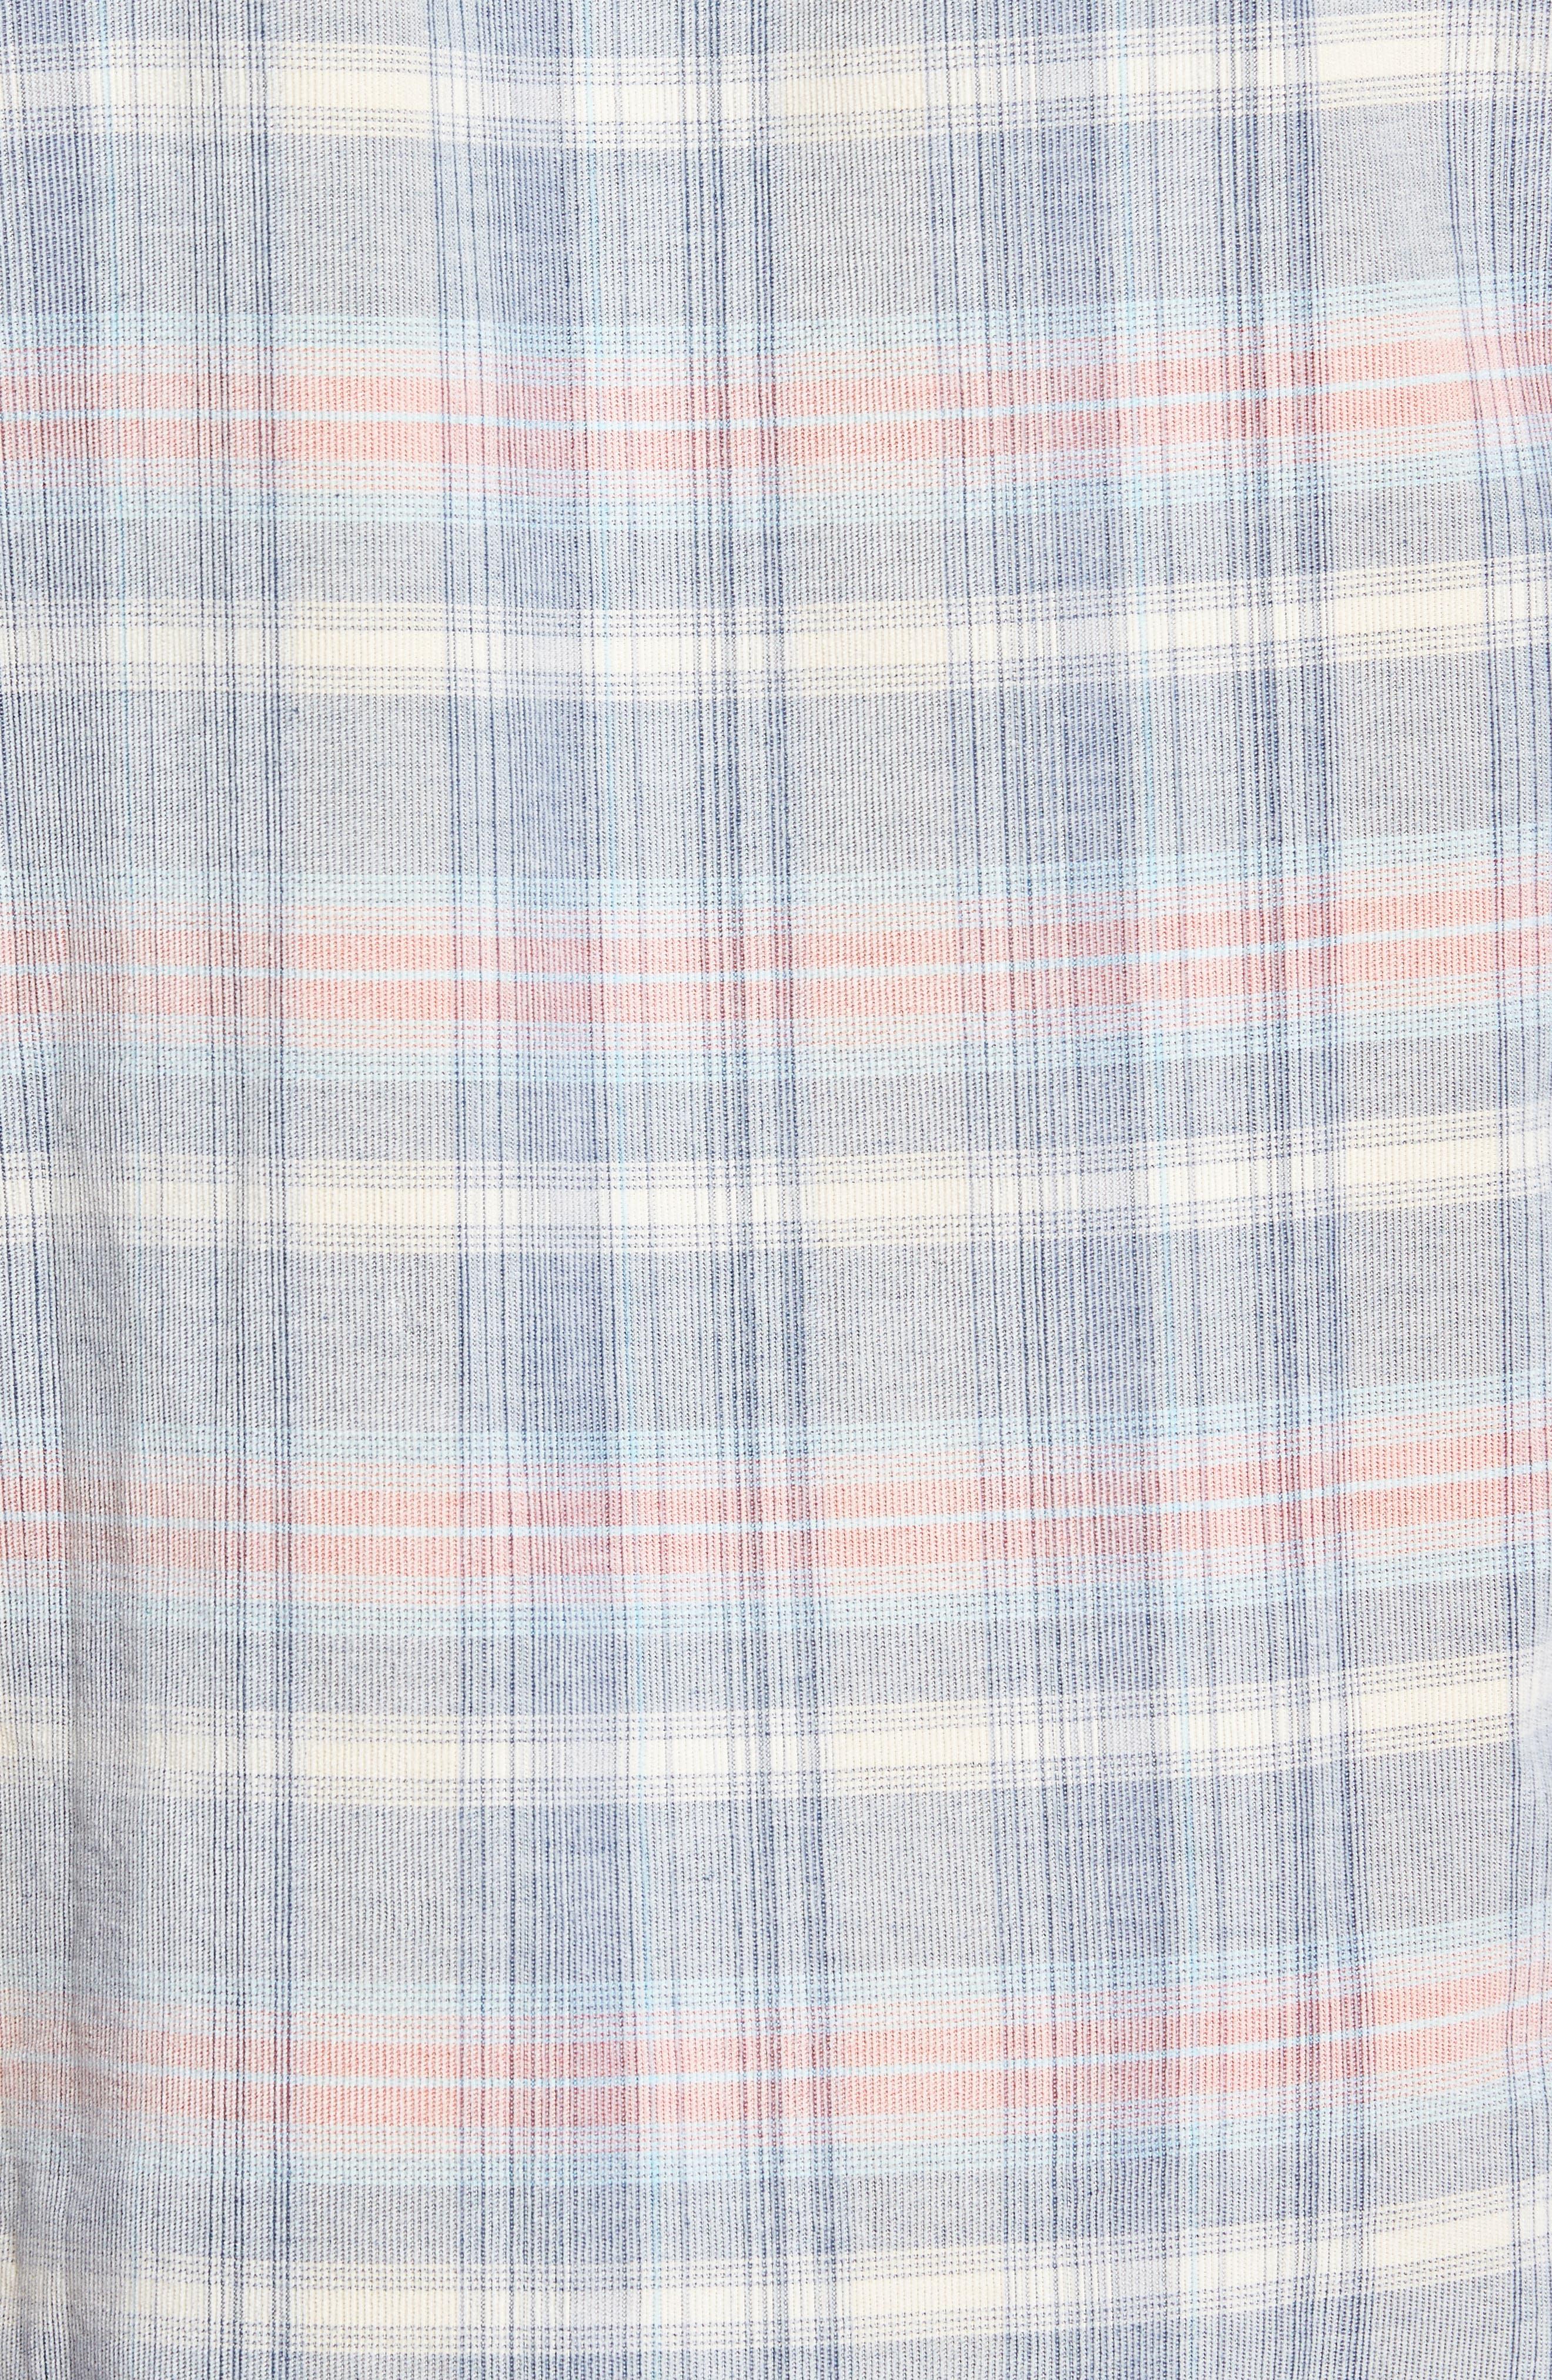 Cordwalk Plaid Plaid Sport Shirt,                             Alternate thumbnail 5, color,                             400